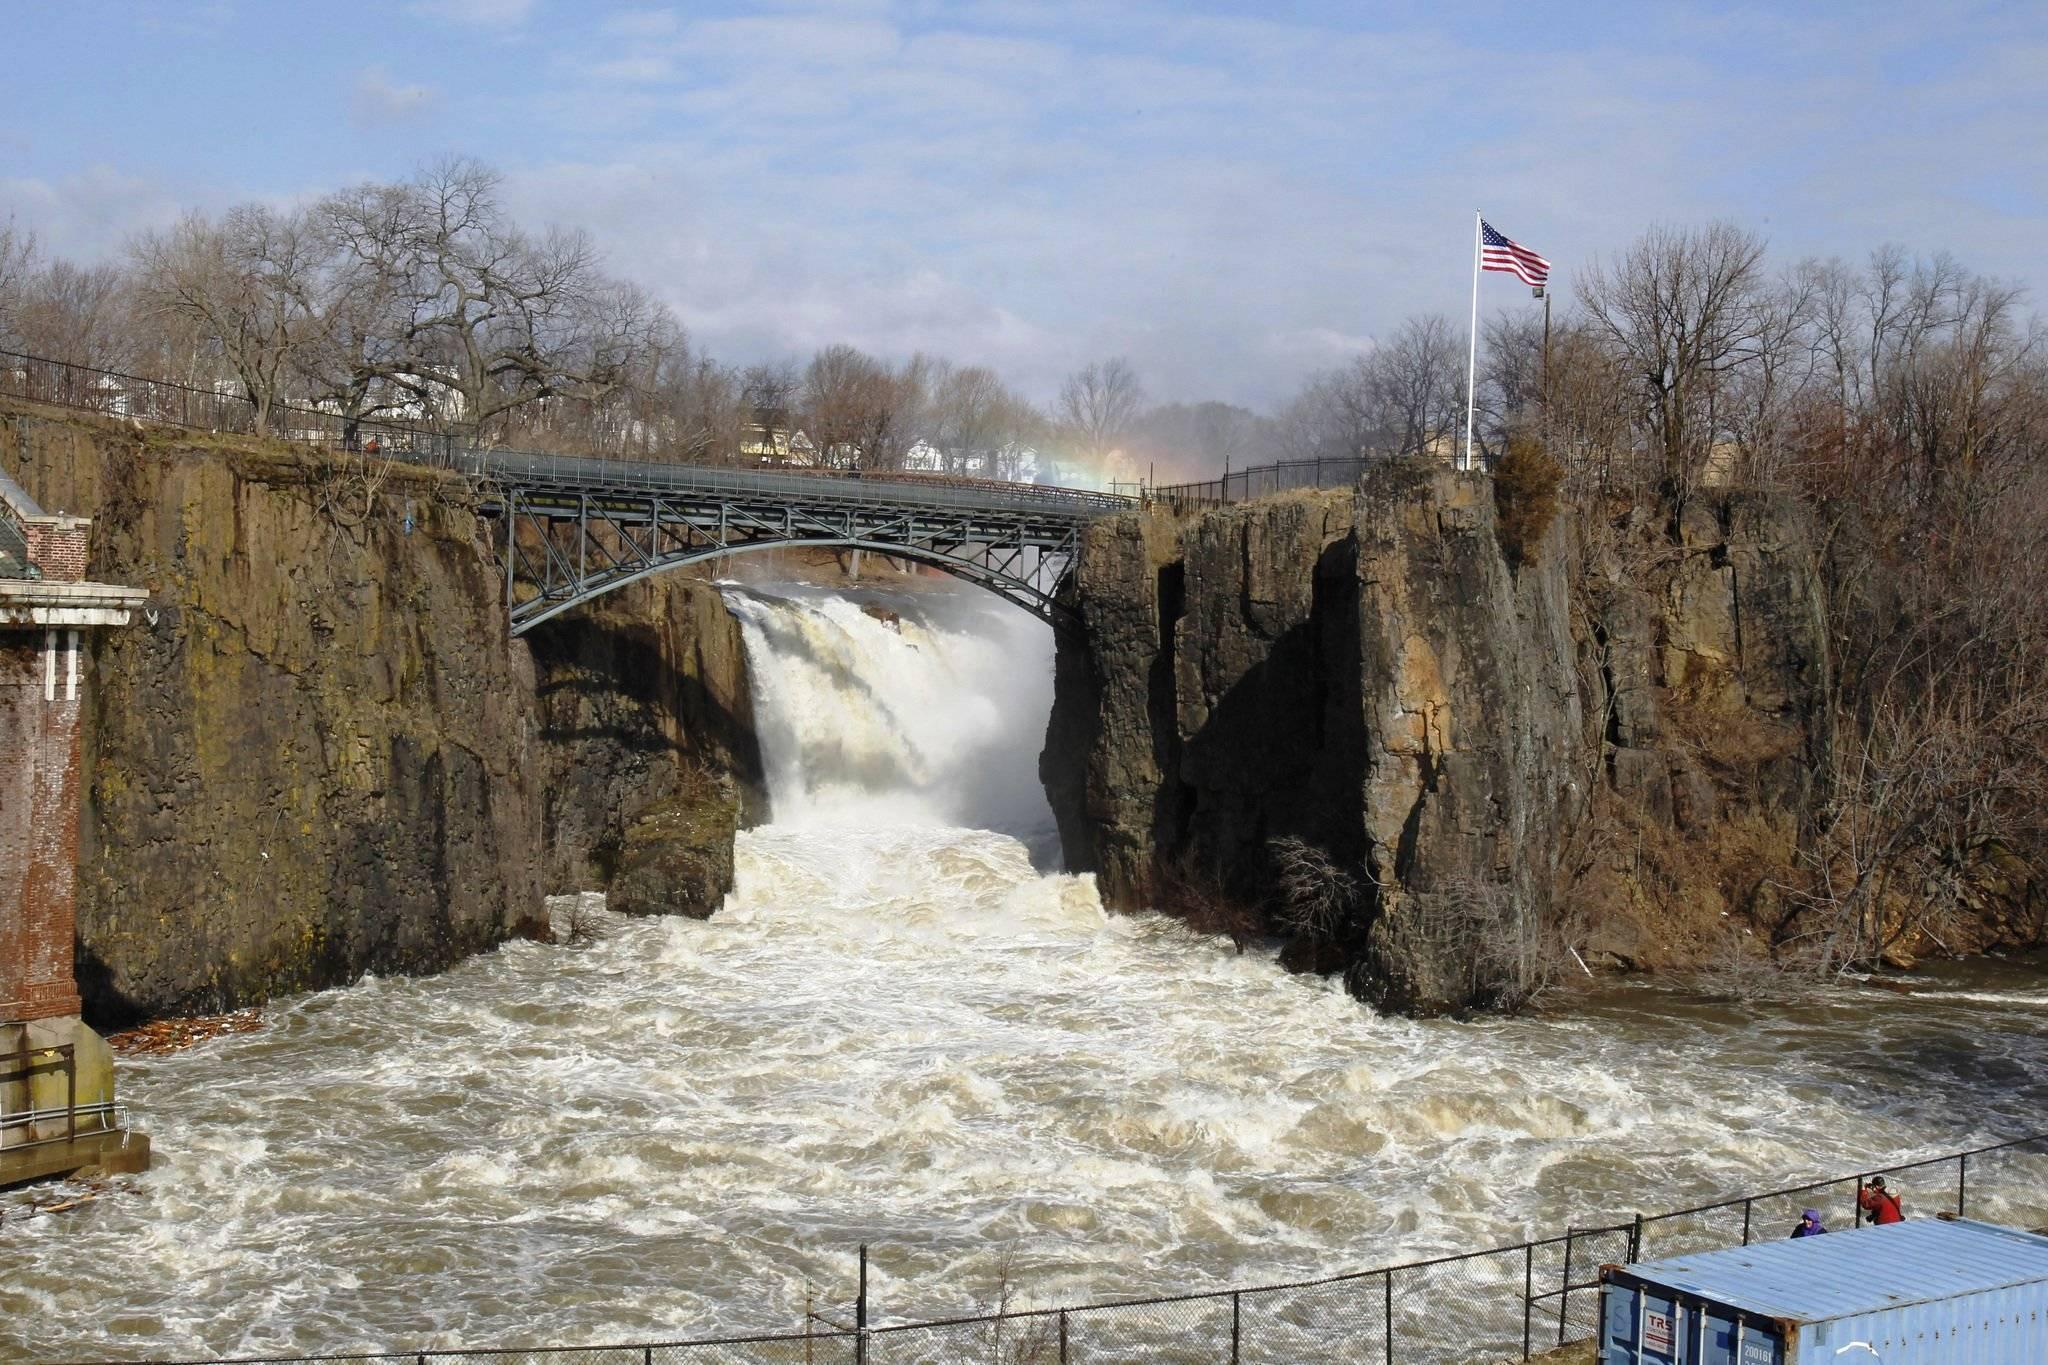 3c366322266abaa1f47b_the-great-falls-caa8c28a766c7fe8.jpg